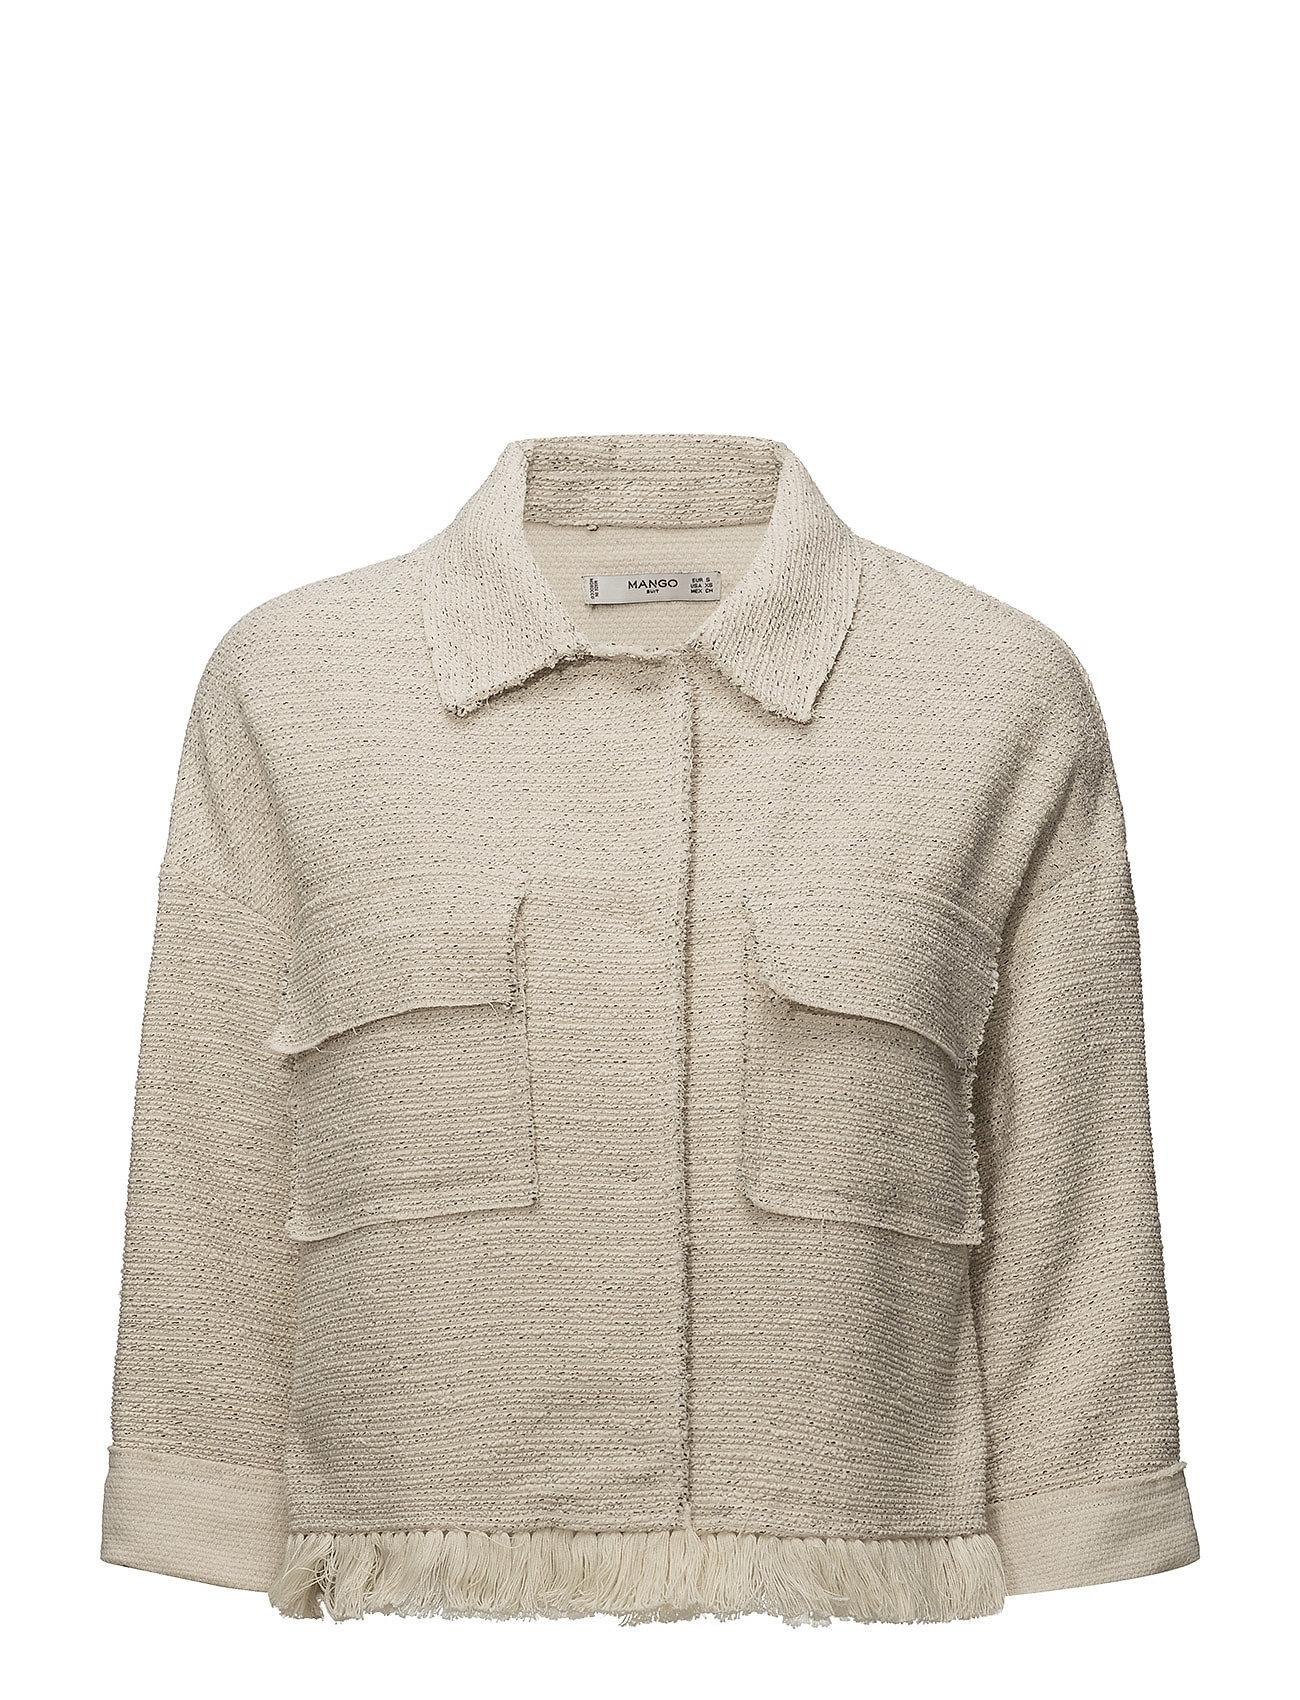 Mango Pocket tweed jacket